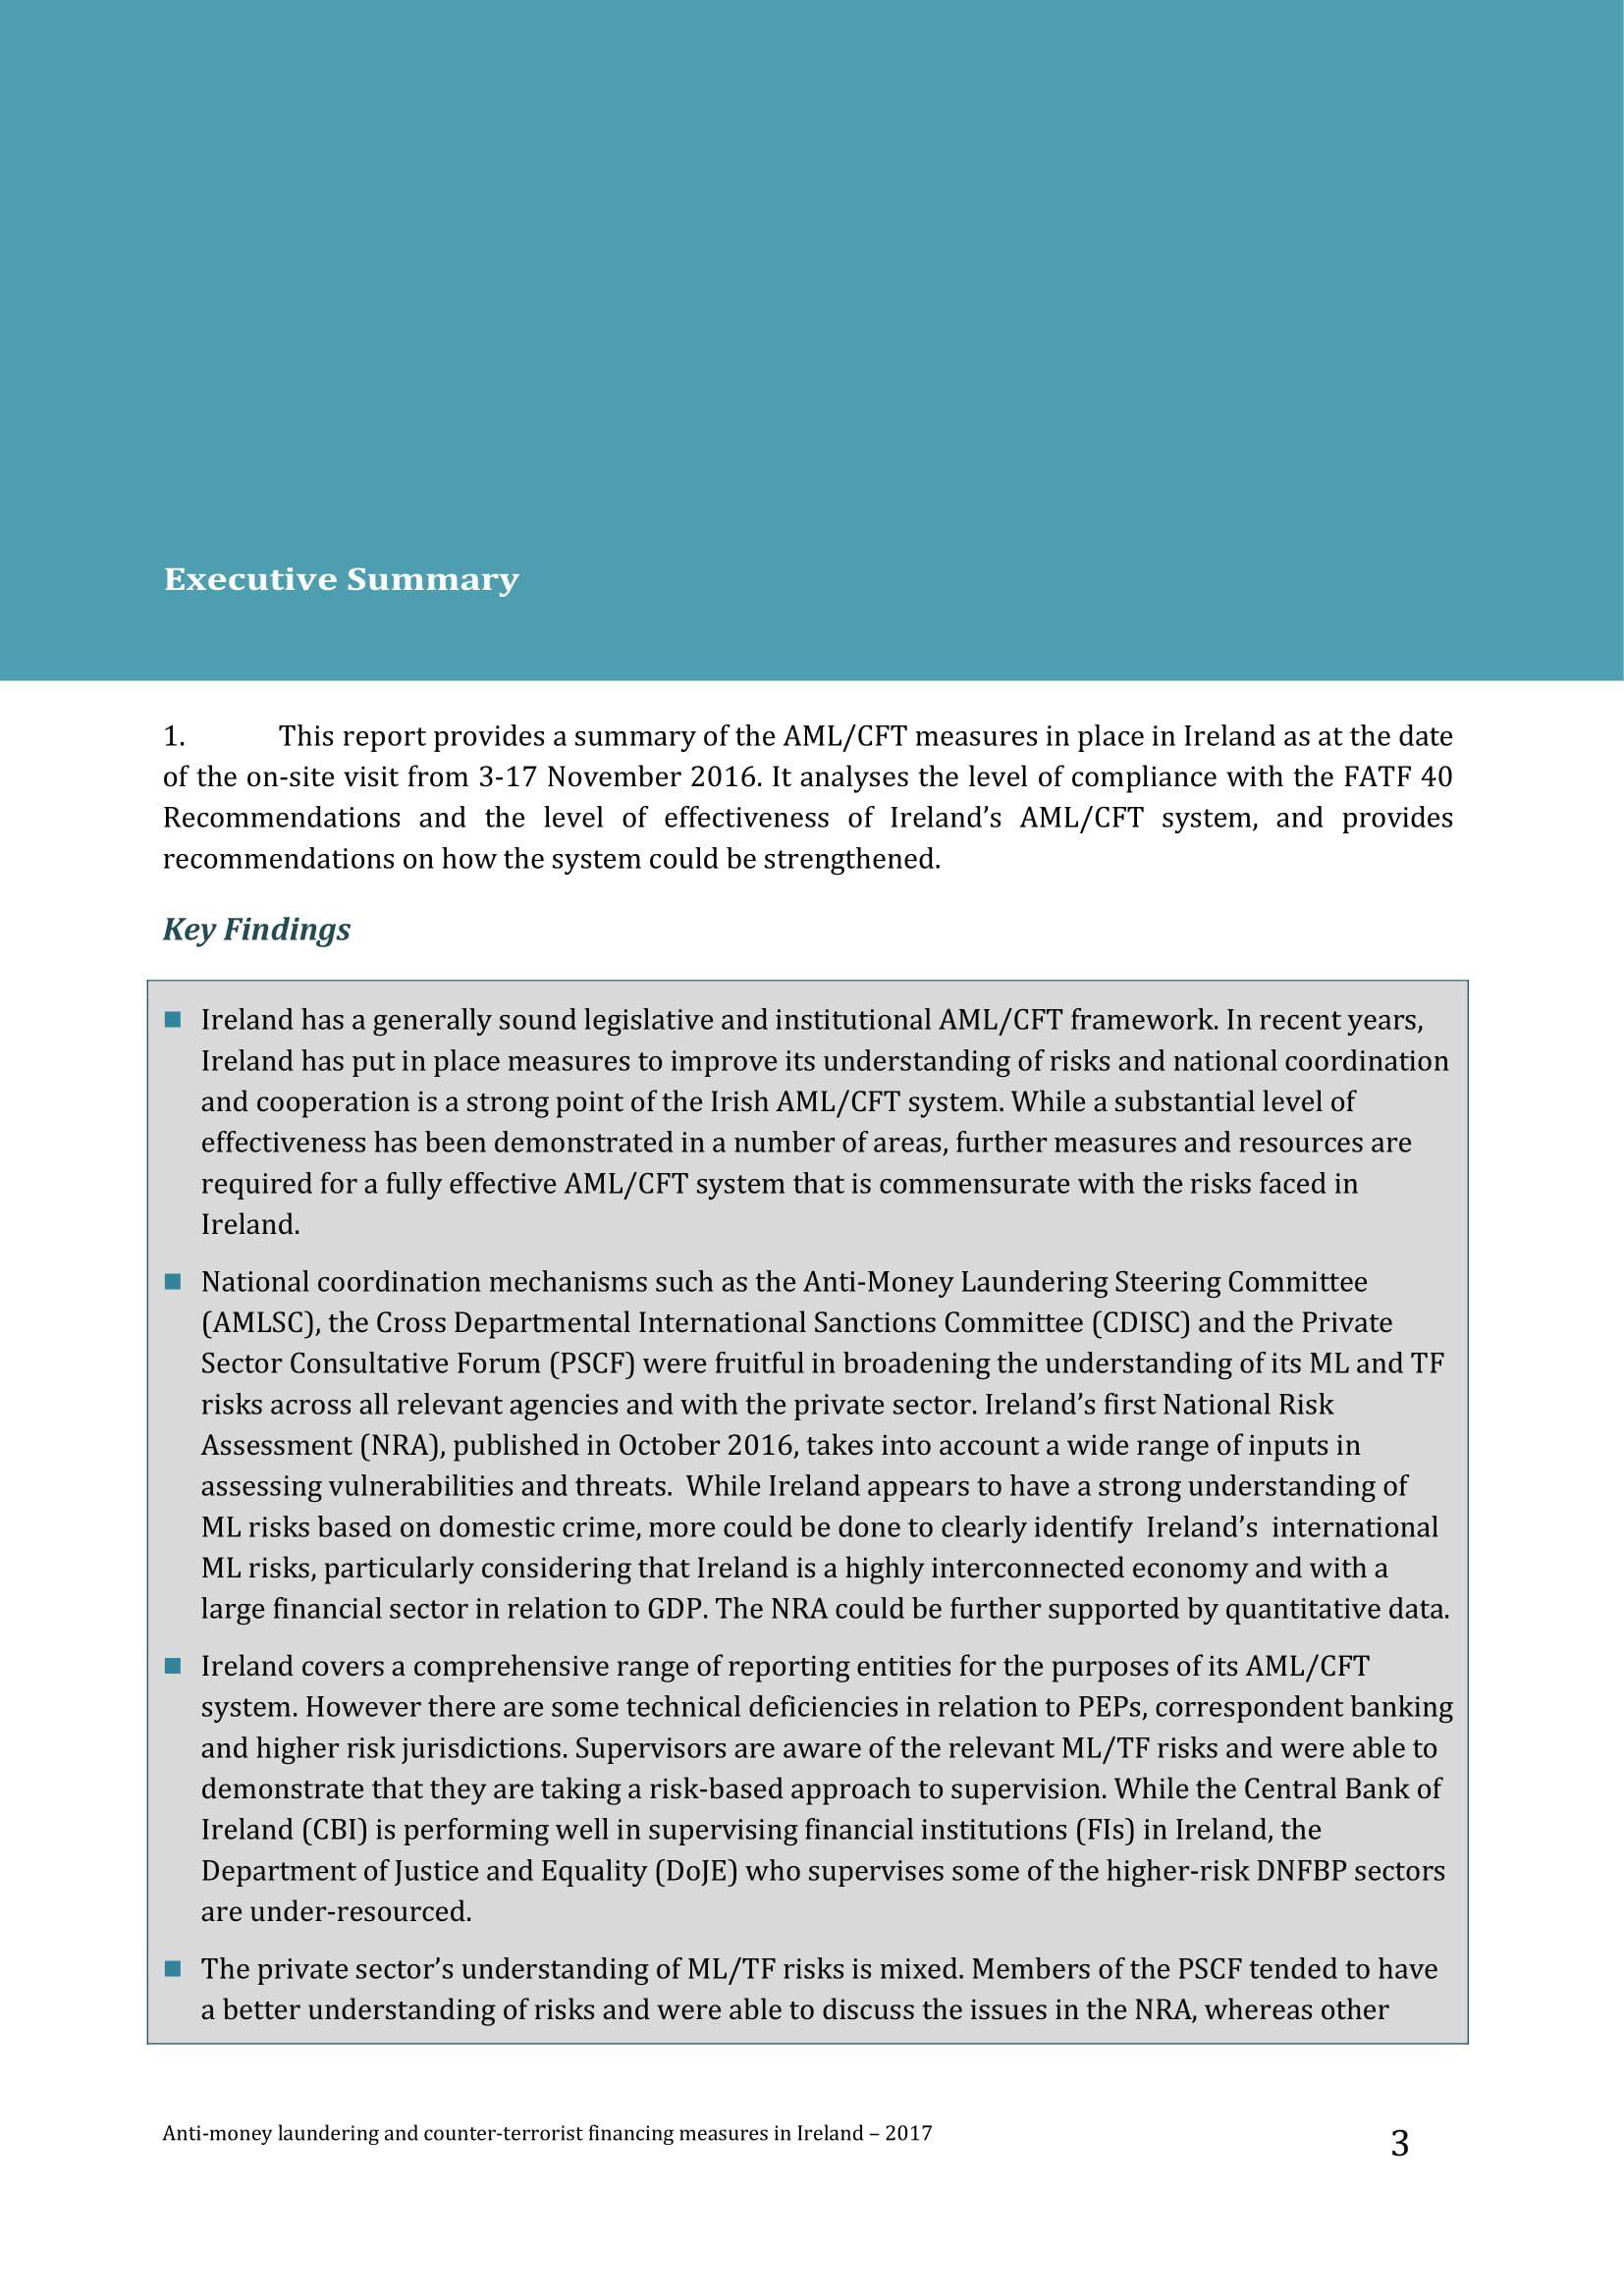 008 Singular Executive Summary Report Word Template High Resolution Full